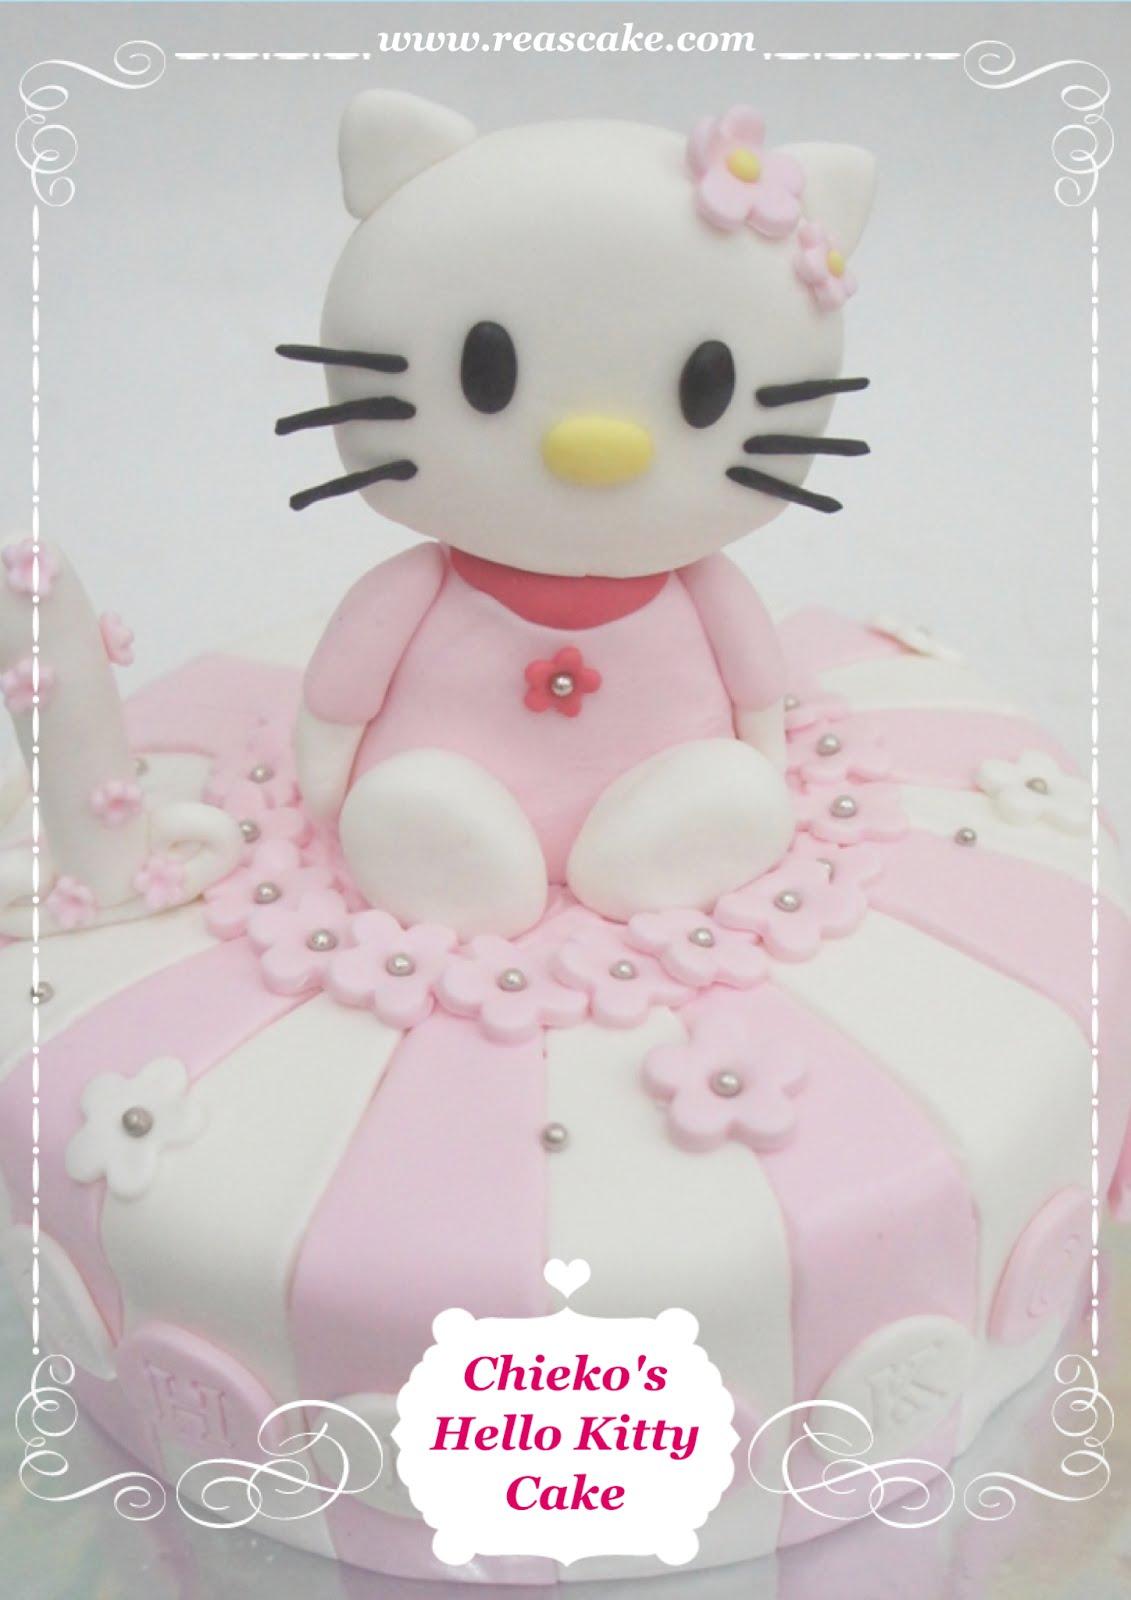 reas küche: hello kitty cake untuk chieko